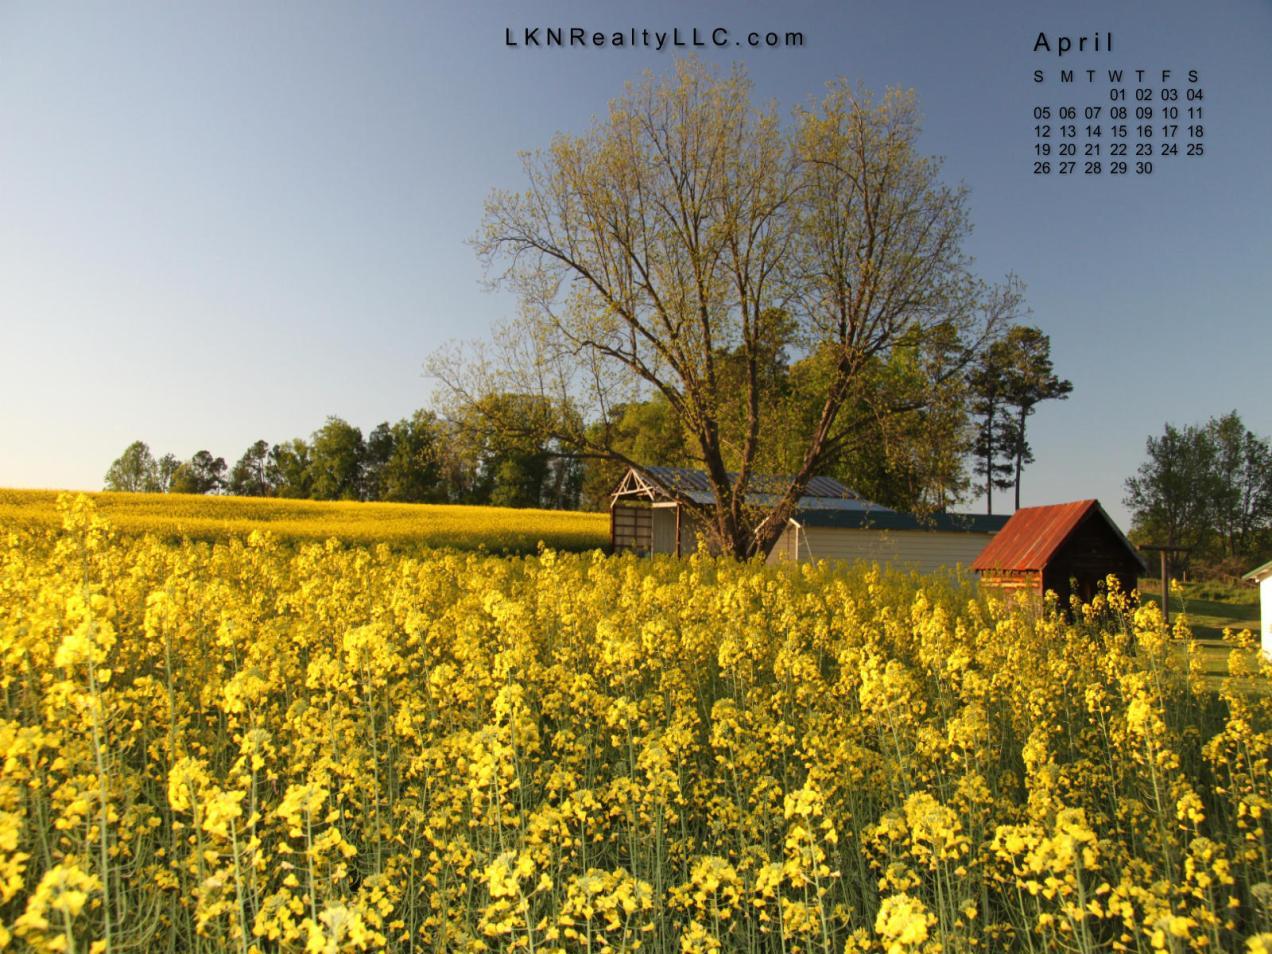 Lake Norman Real Estate's April 2015 Desktop Calendar